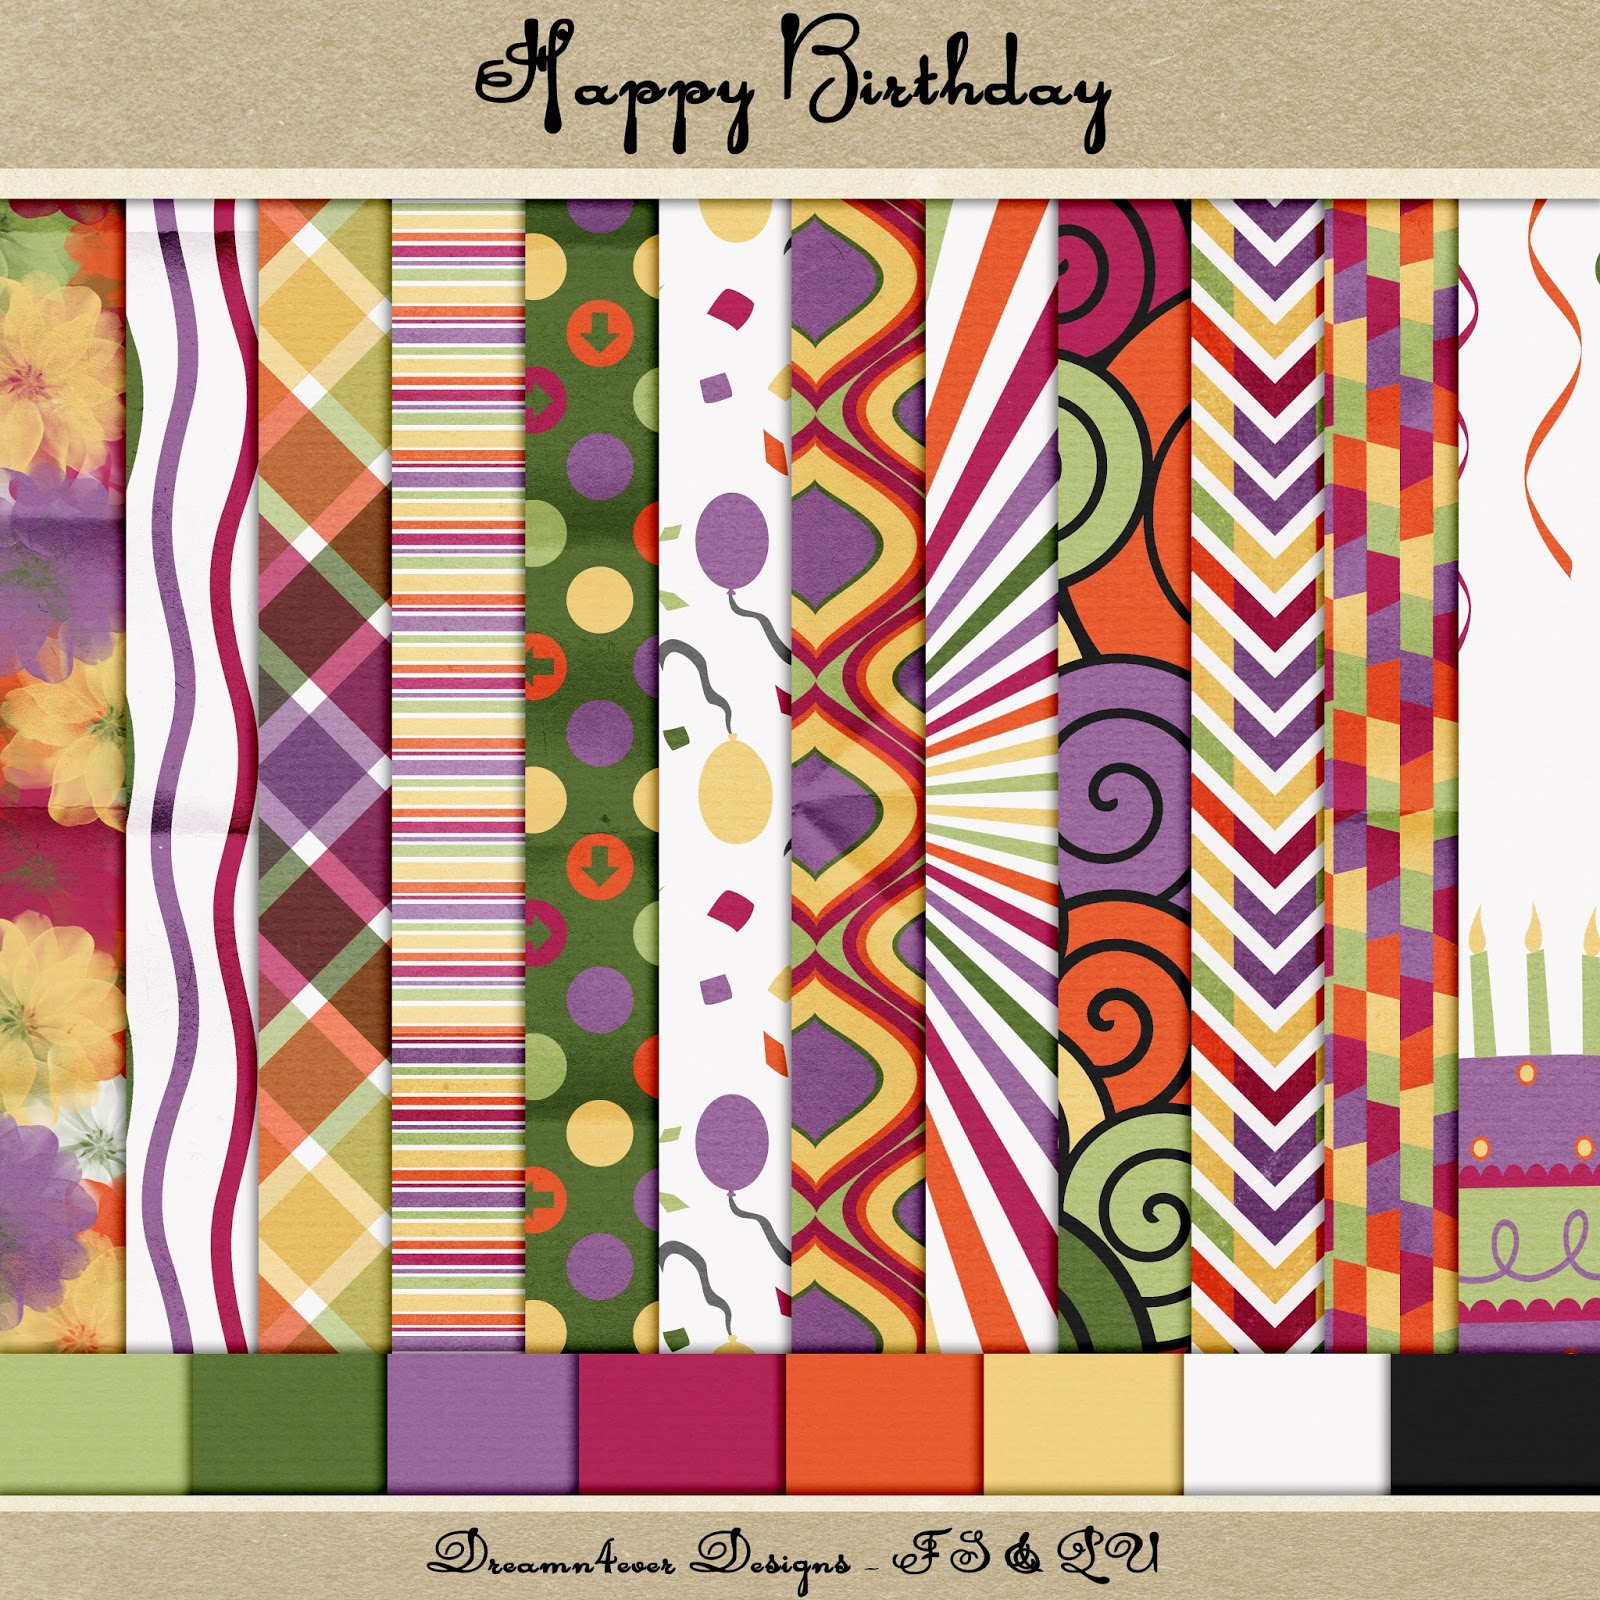 Dreamn4ever Designs: Happy 2nd Birthday